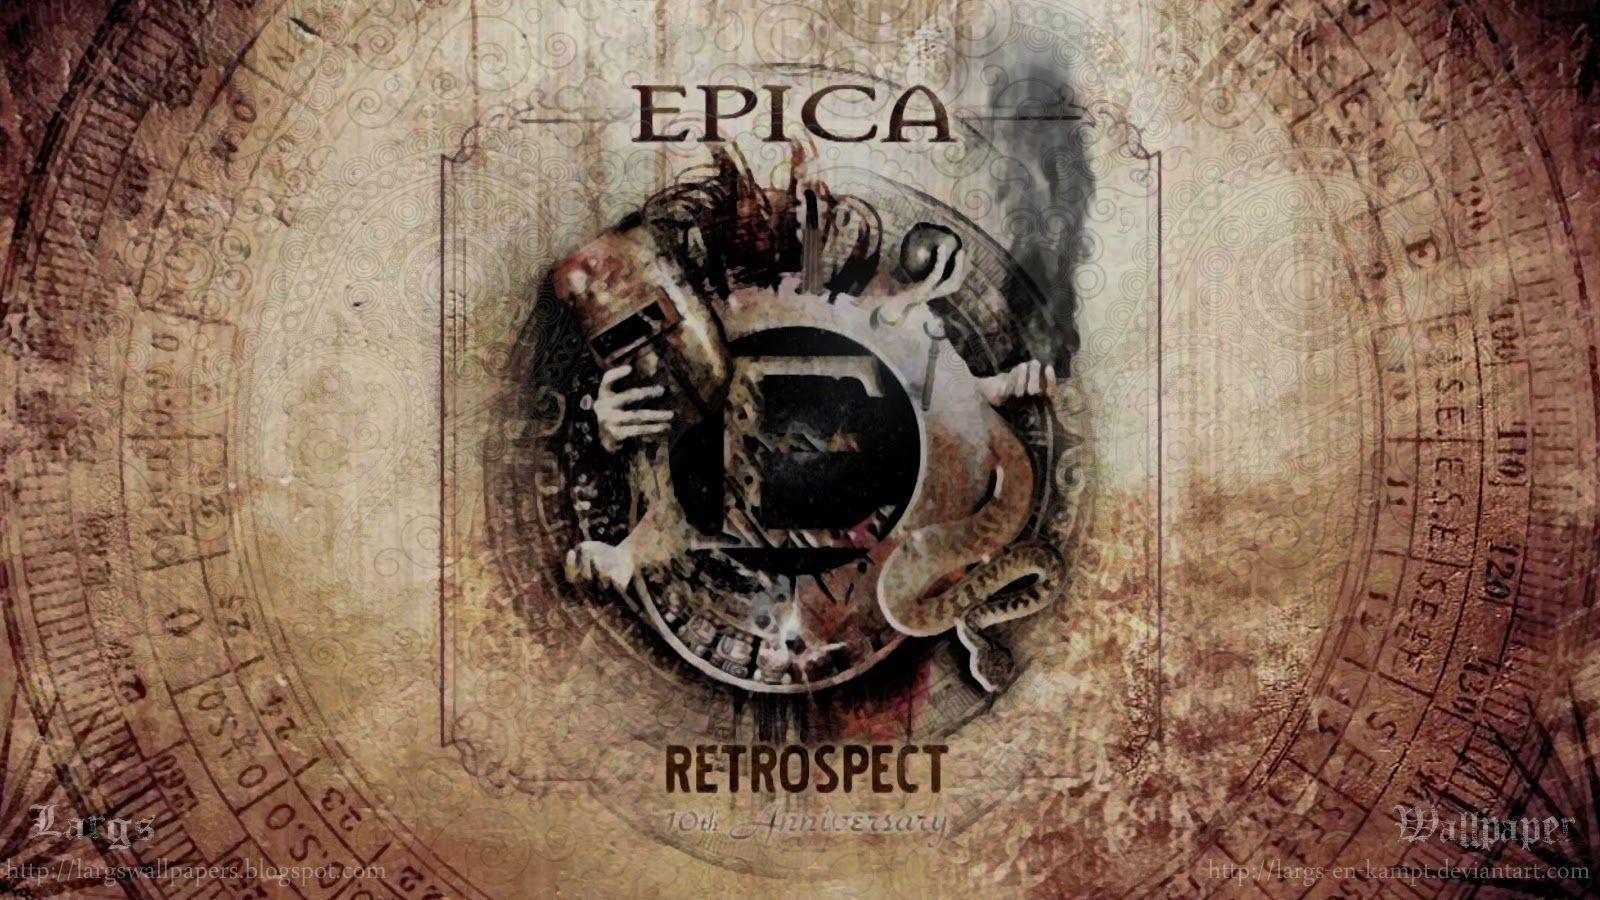 53° EPICA WALLPAPER - RETROSPECT